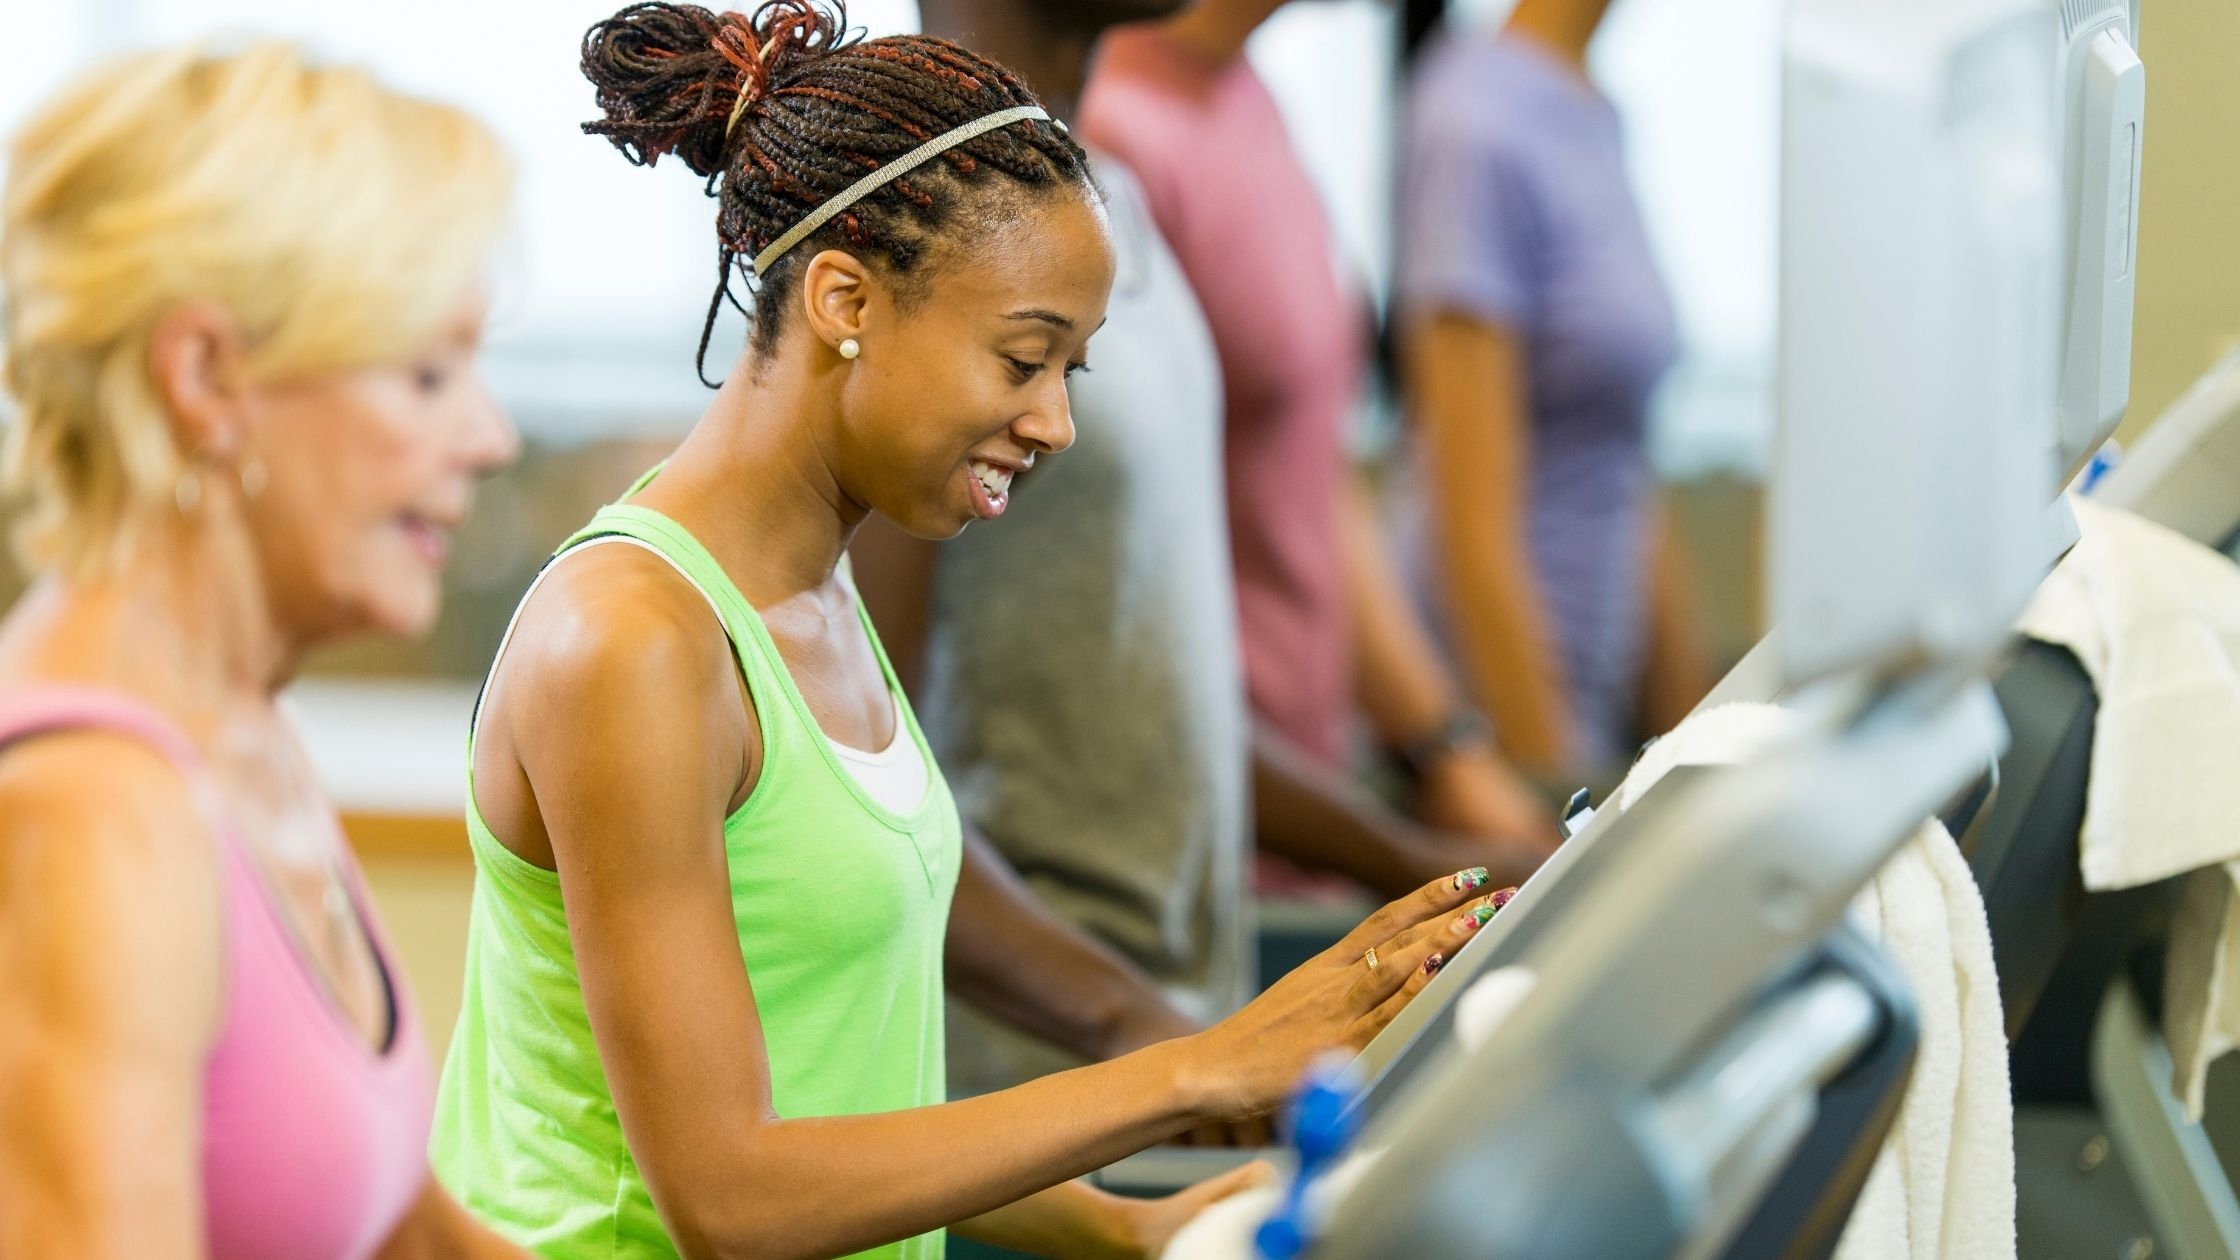 types of treadmills